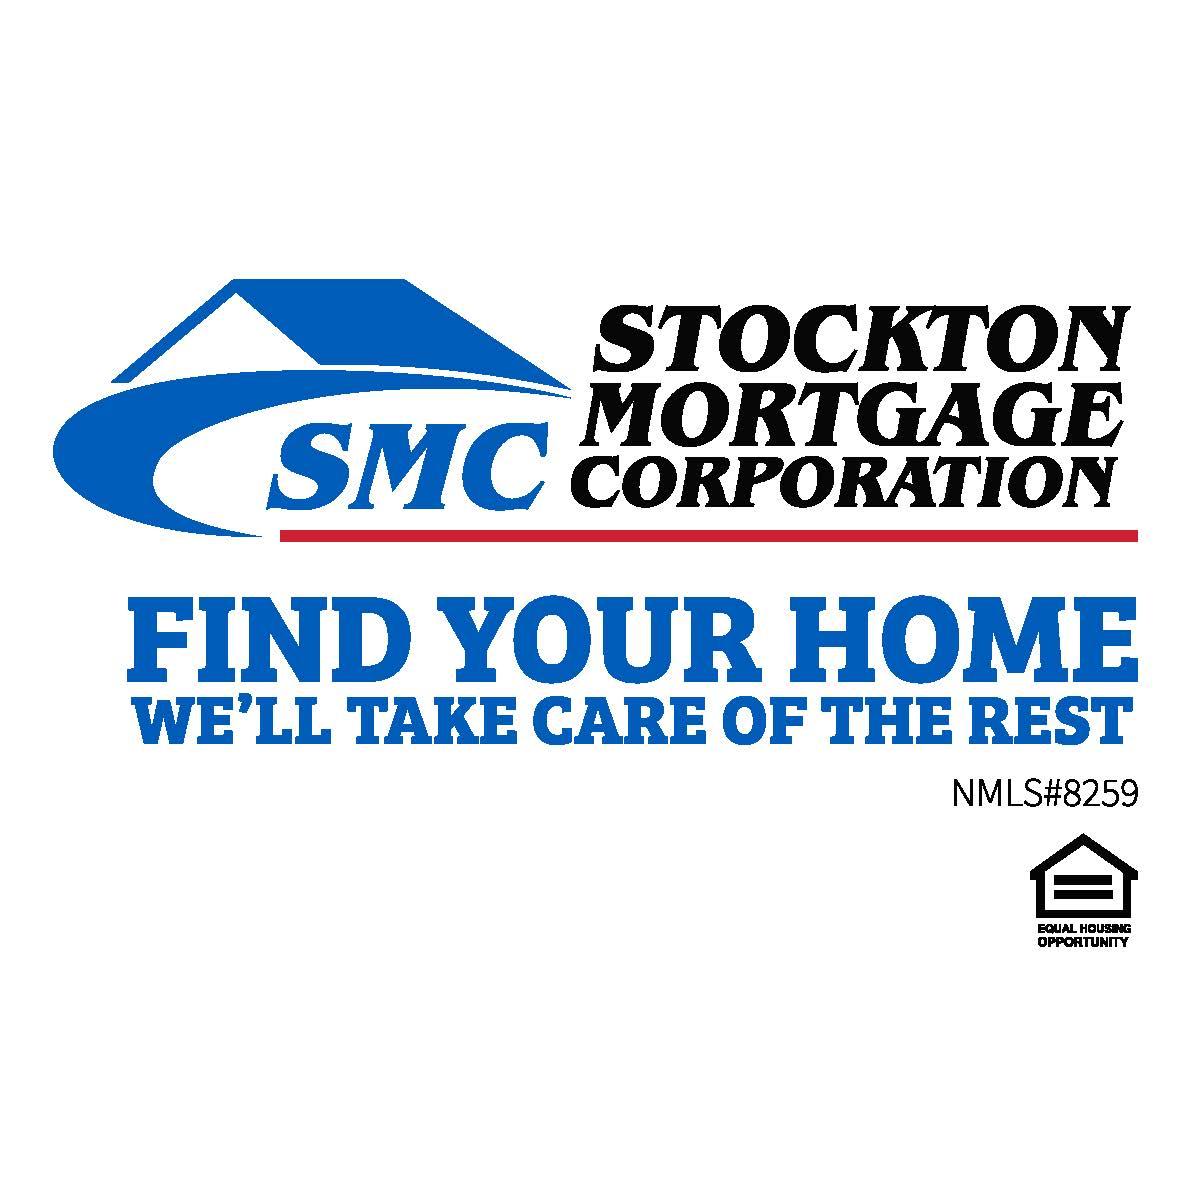 Stockton Mortgage Corporation